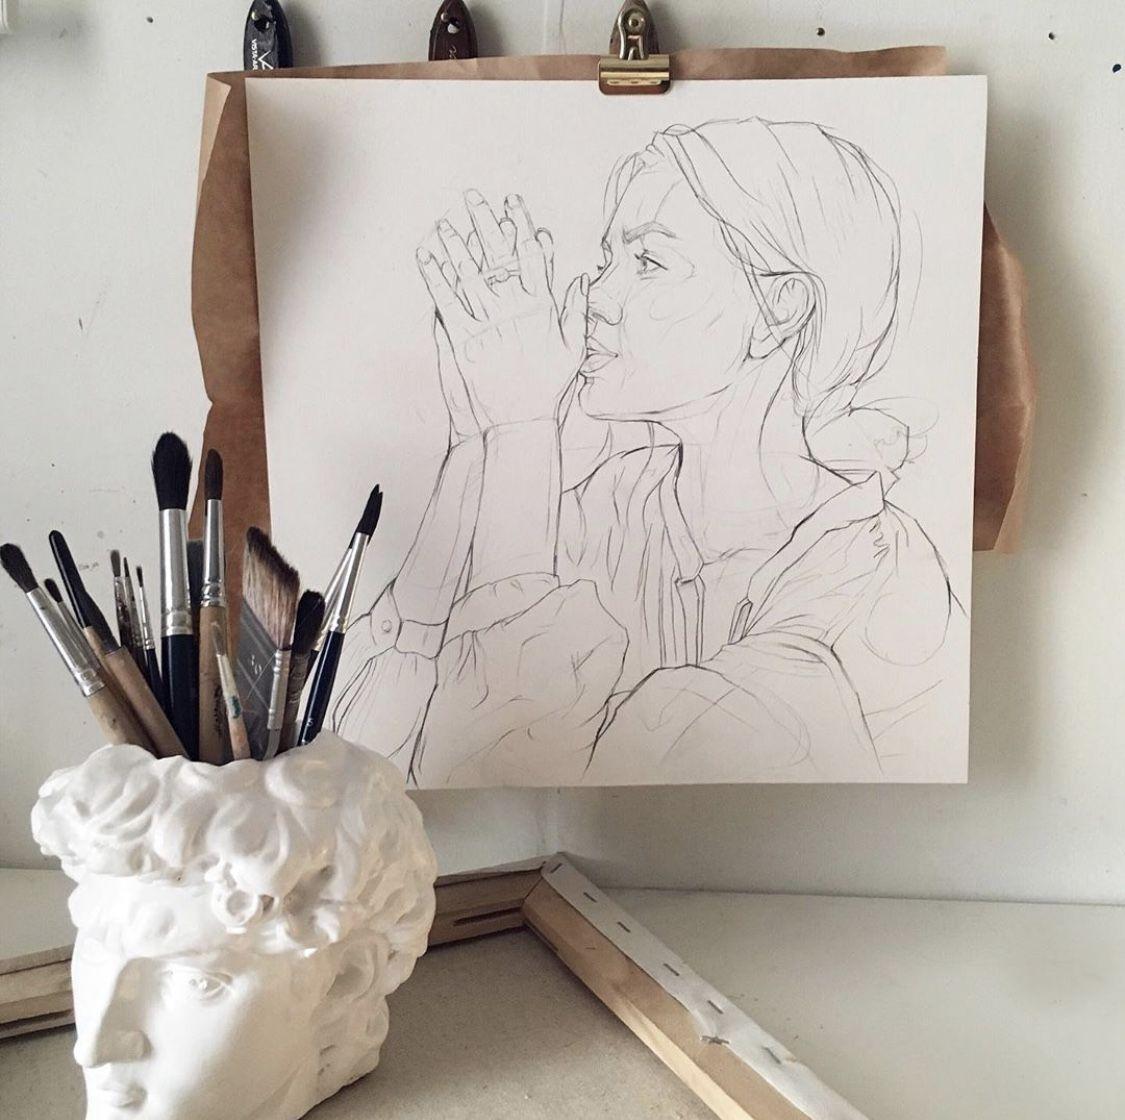 David Bust by Michelangelo Antique Desk Organizer. Pen | Etsy